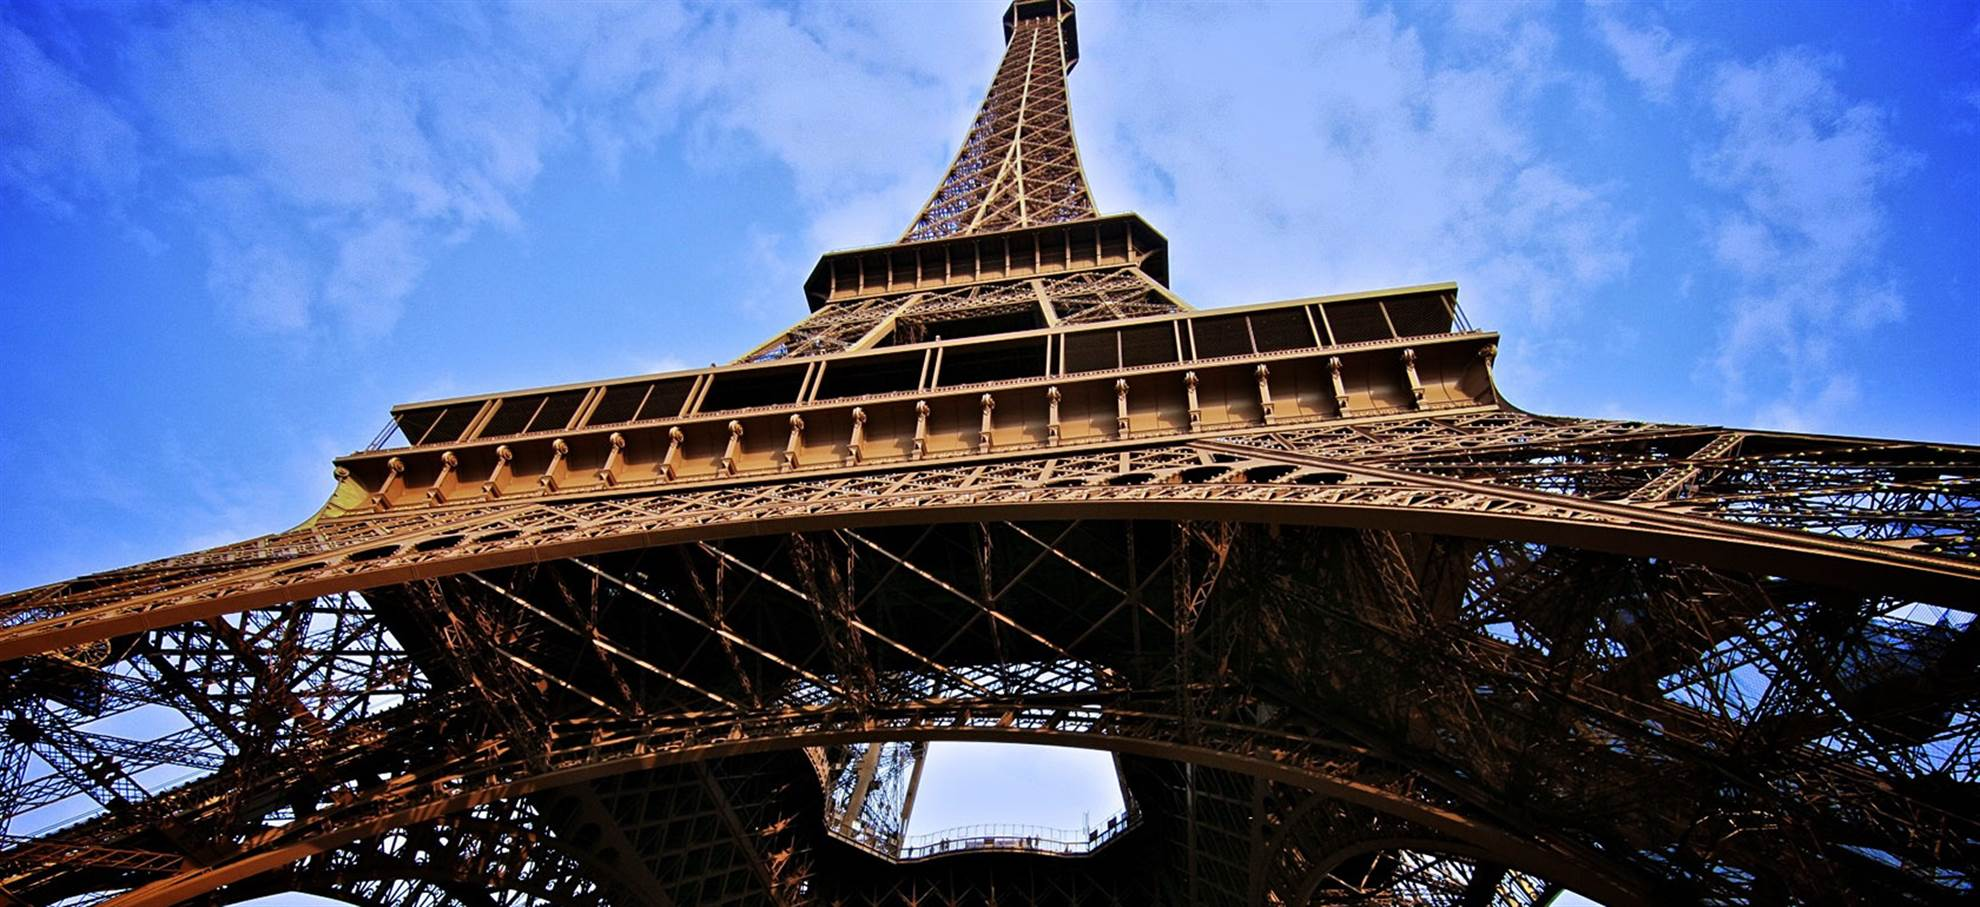 Visita guiada de la torre Eiffel